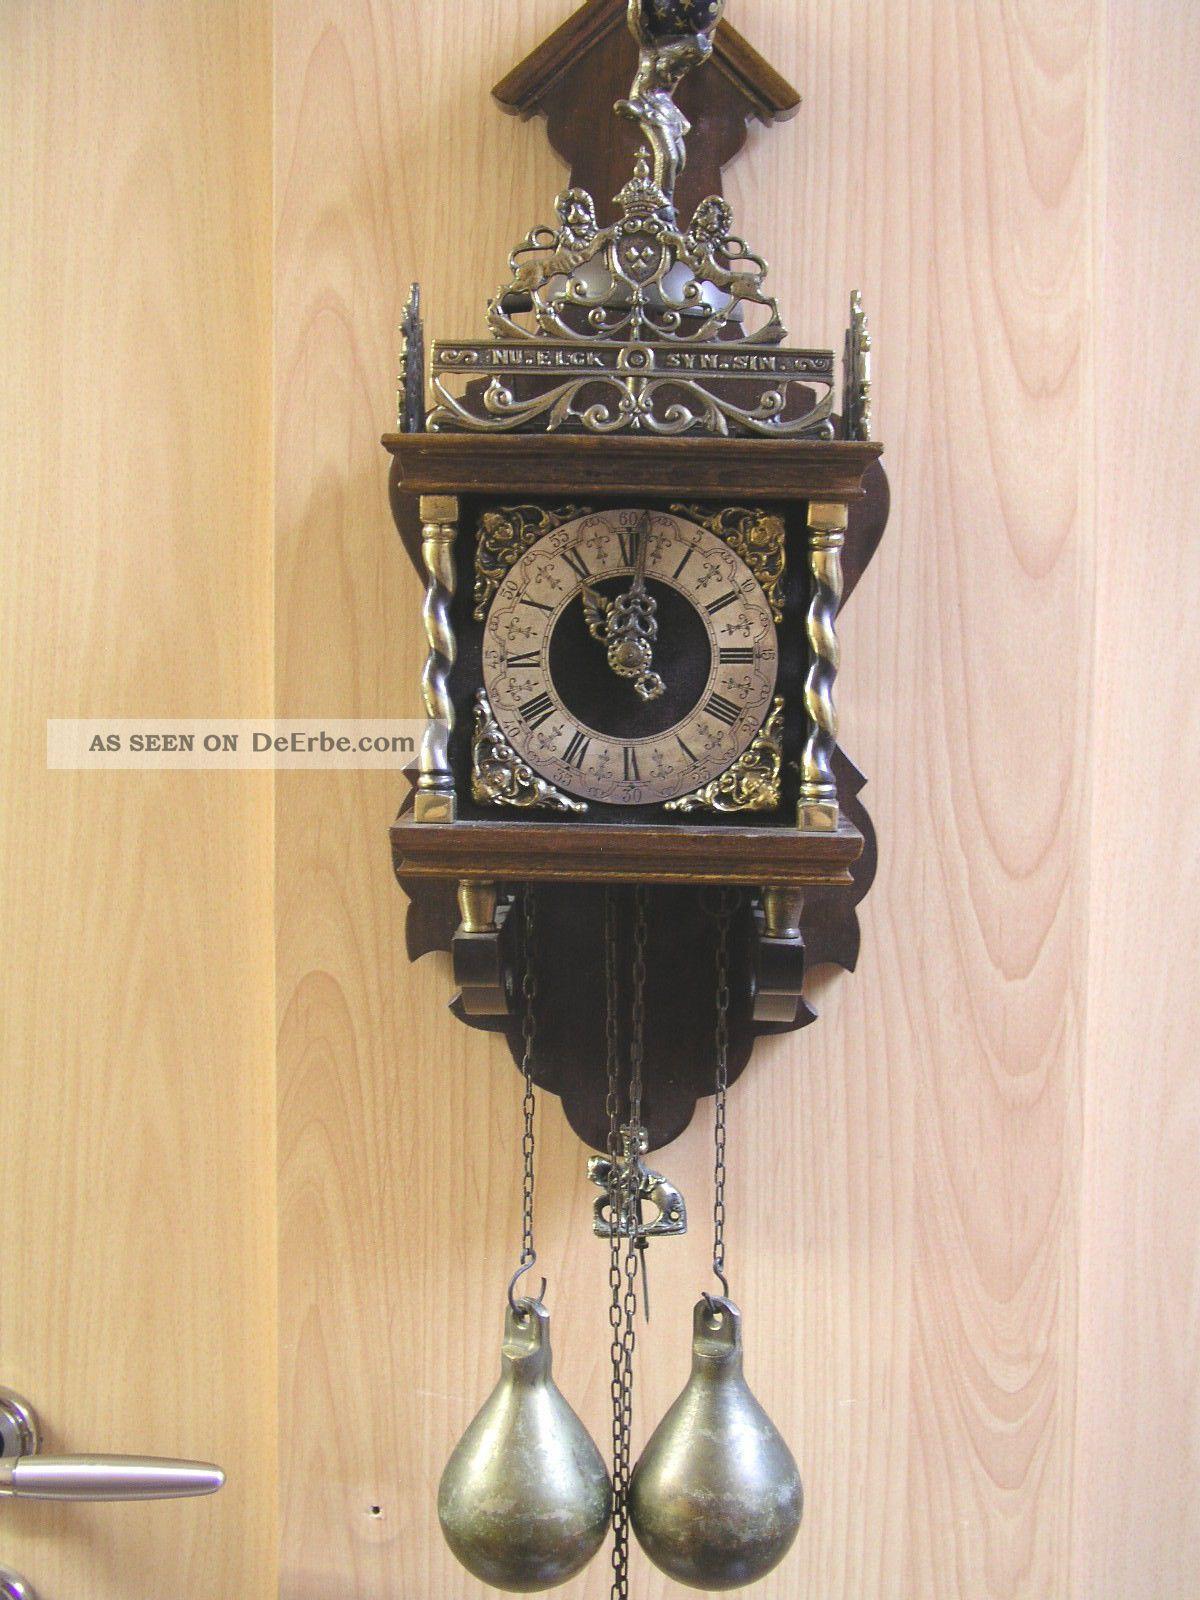 sehr gro e wuba zaanse clock reiterpendel sichtbar regulator wanduhr friesenuhr. Black Bedroom Furniture Sets. Home Design Ideas